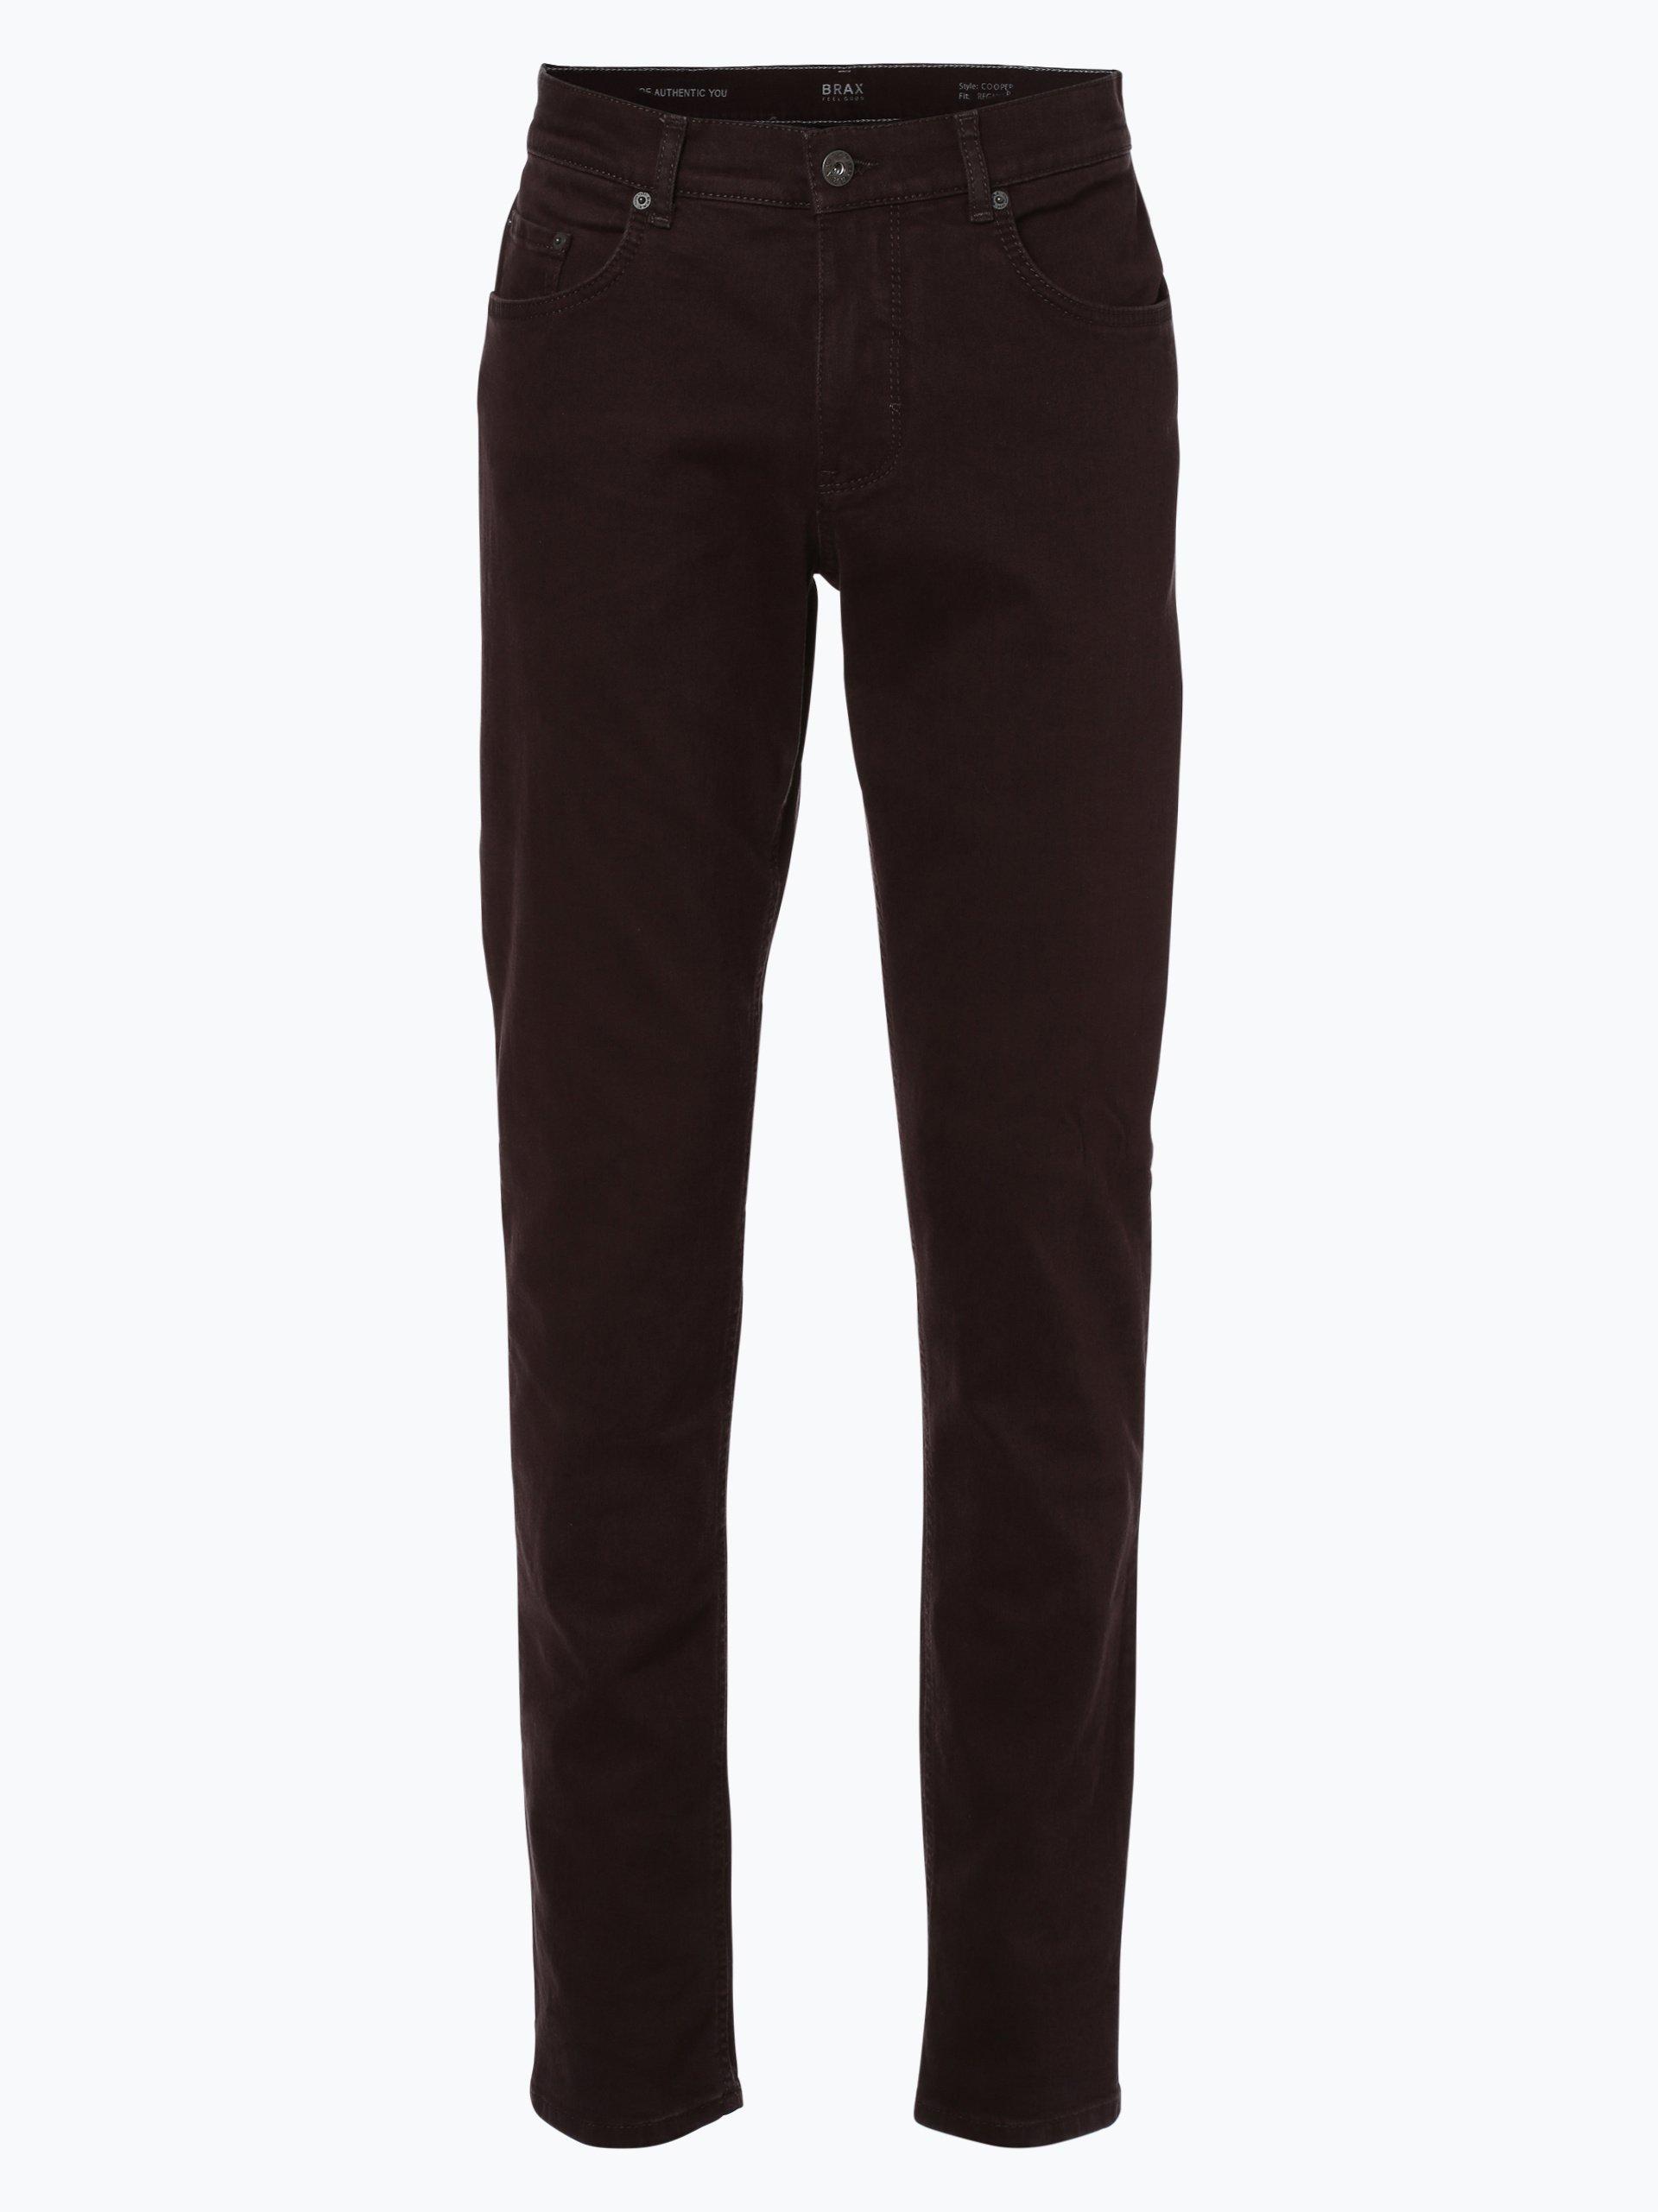 brax herren jeans cooper schoko uni online kaufen peek und cloppenburg de. Black Bedroom Furniture Sets. Home Design Ideas